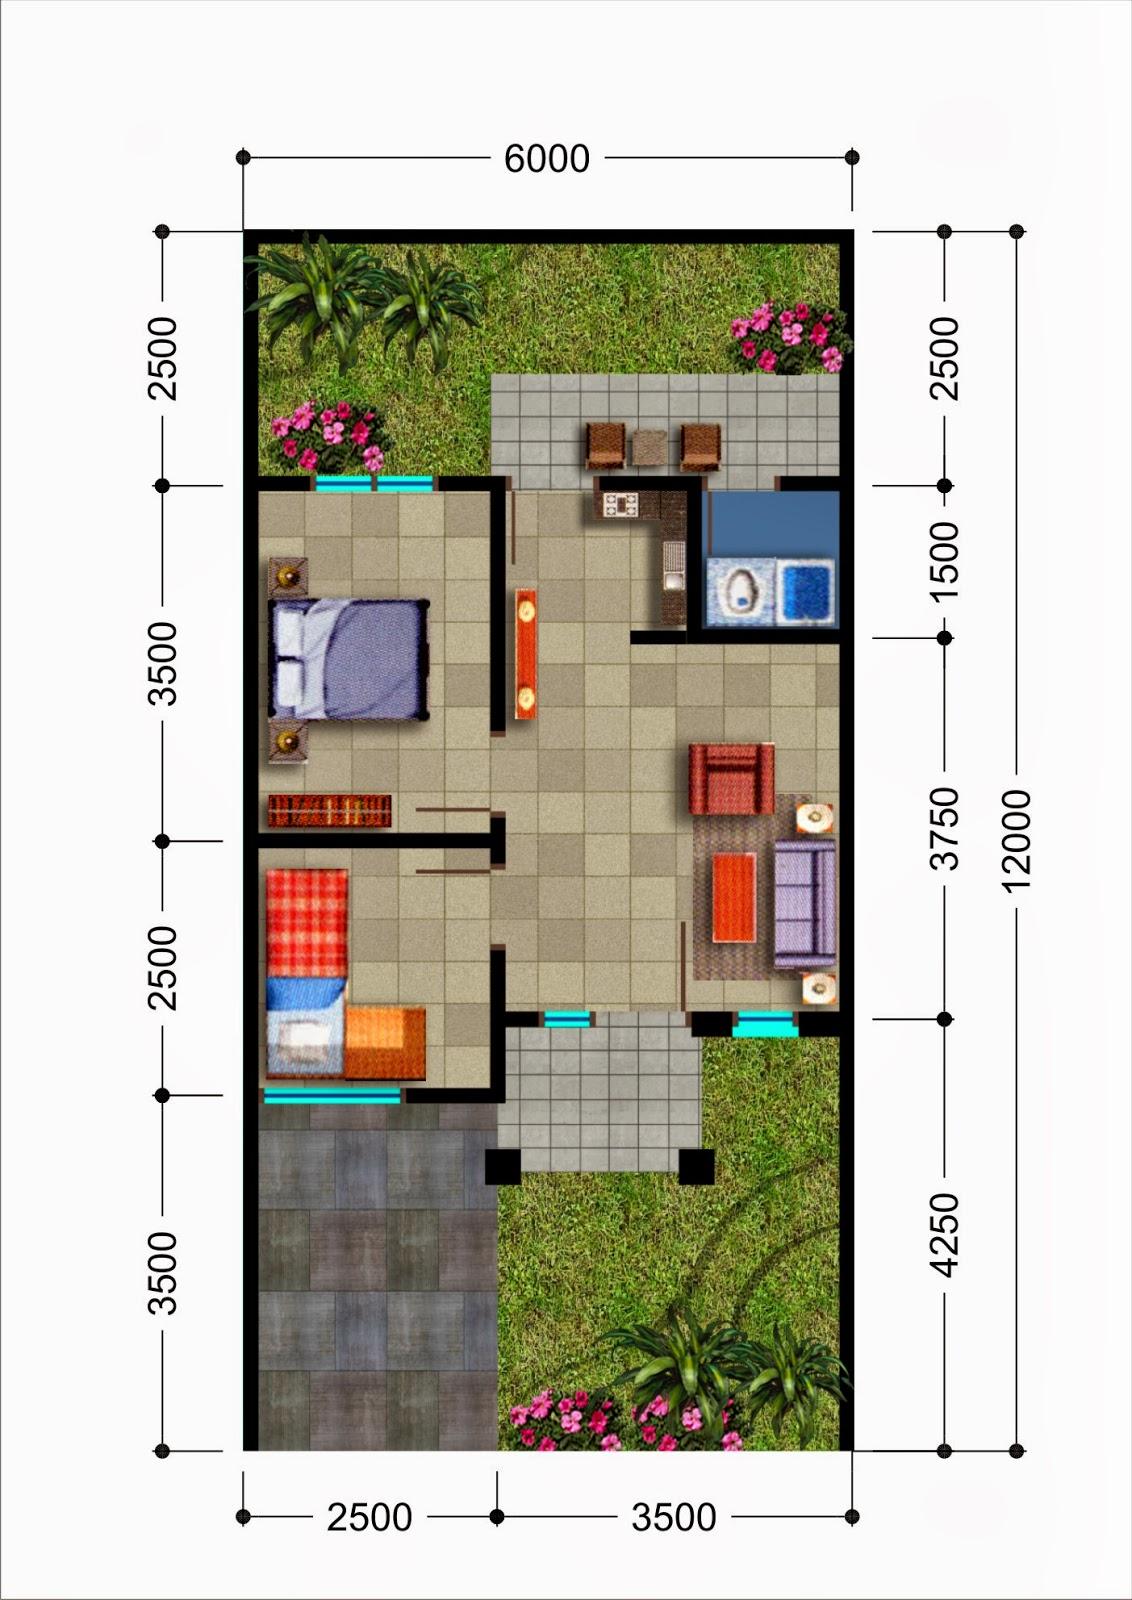 Rencana Cerdas Denah Rumah Minimalis Type 36  Inspiratif